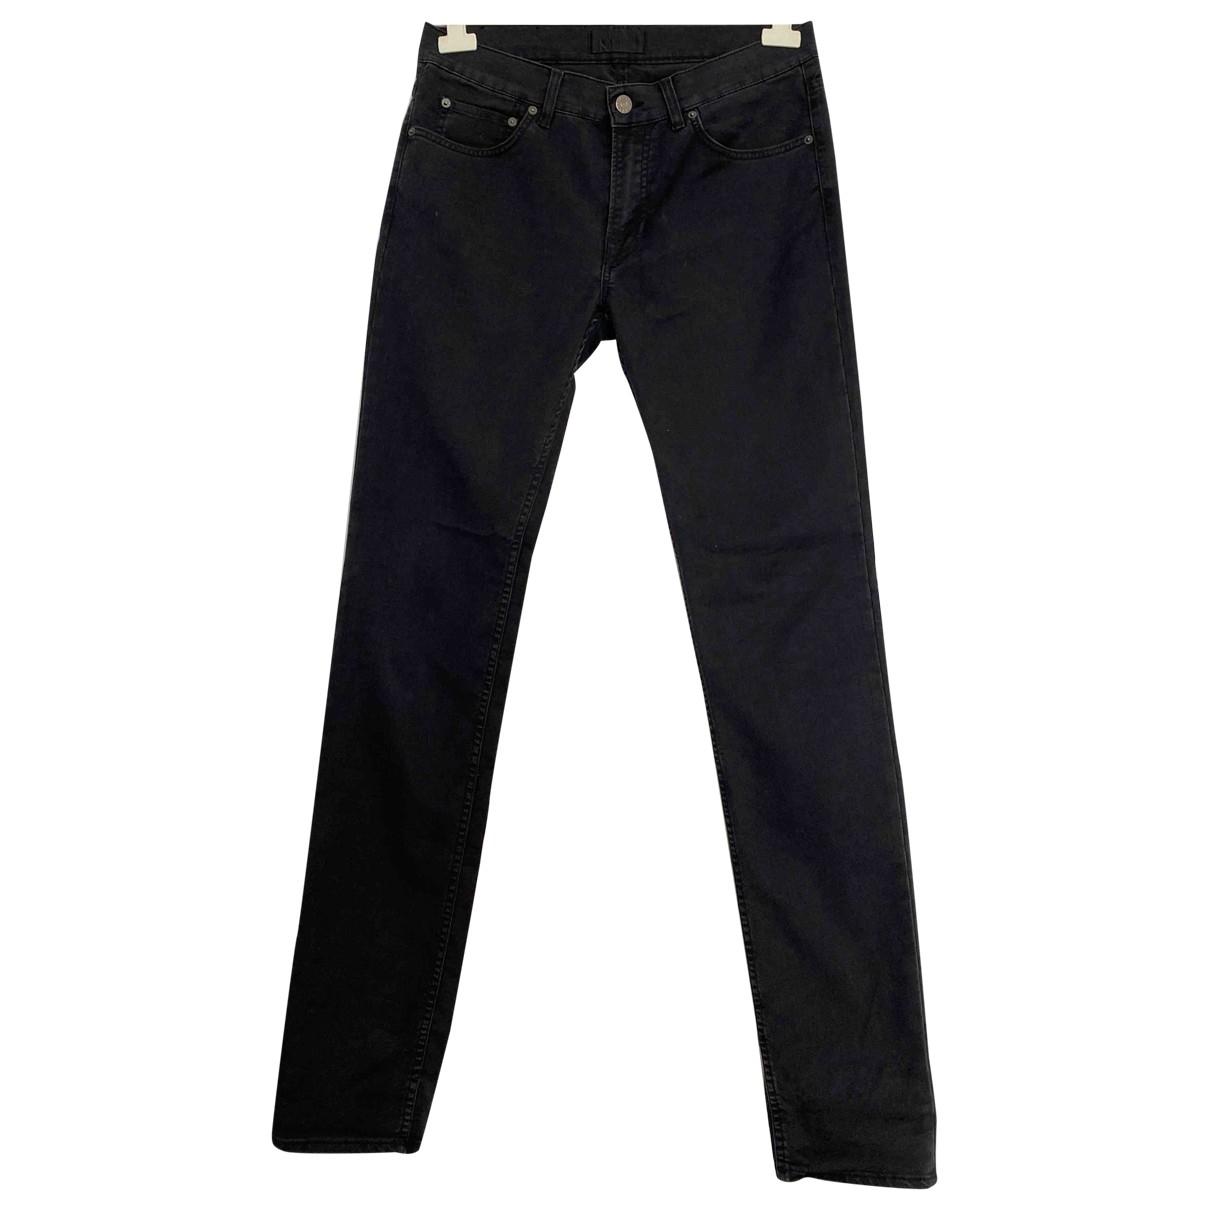 Acne Studios \N Grey Cotton - elasthane Jeans for Men 32 US